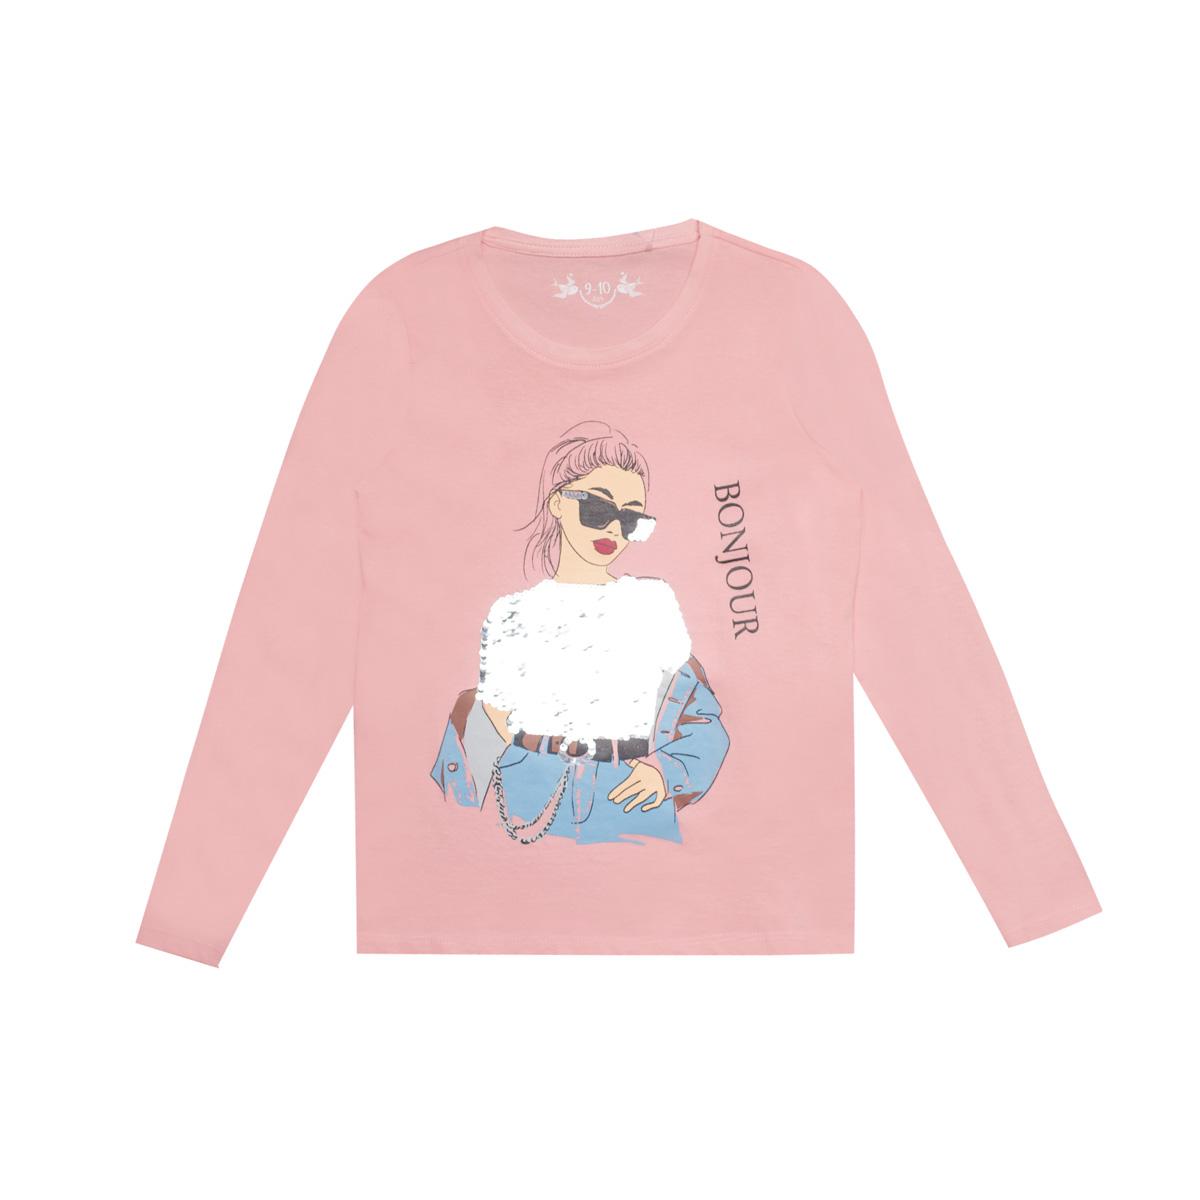 Dekliška majica, svetlo roza